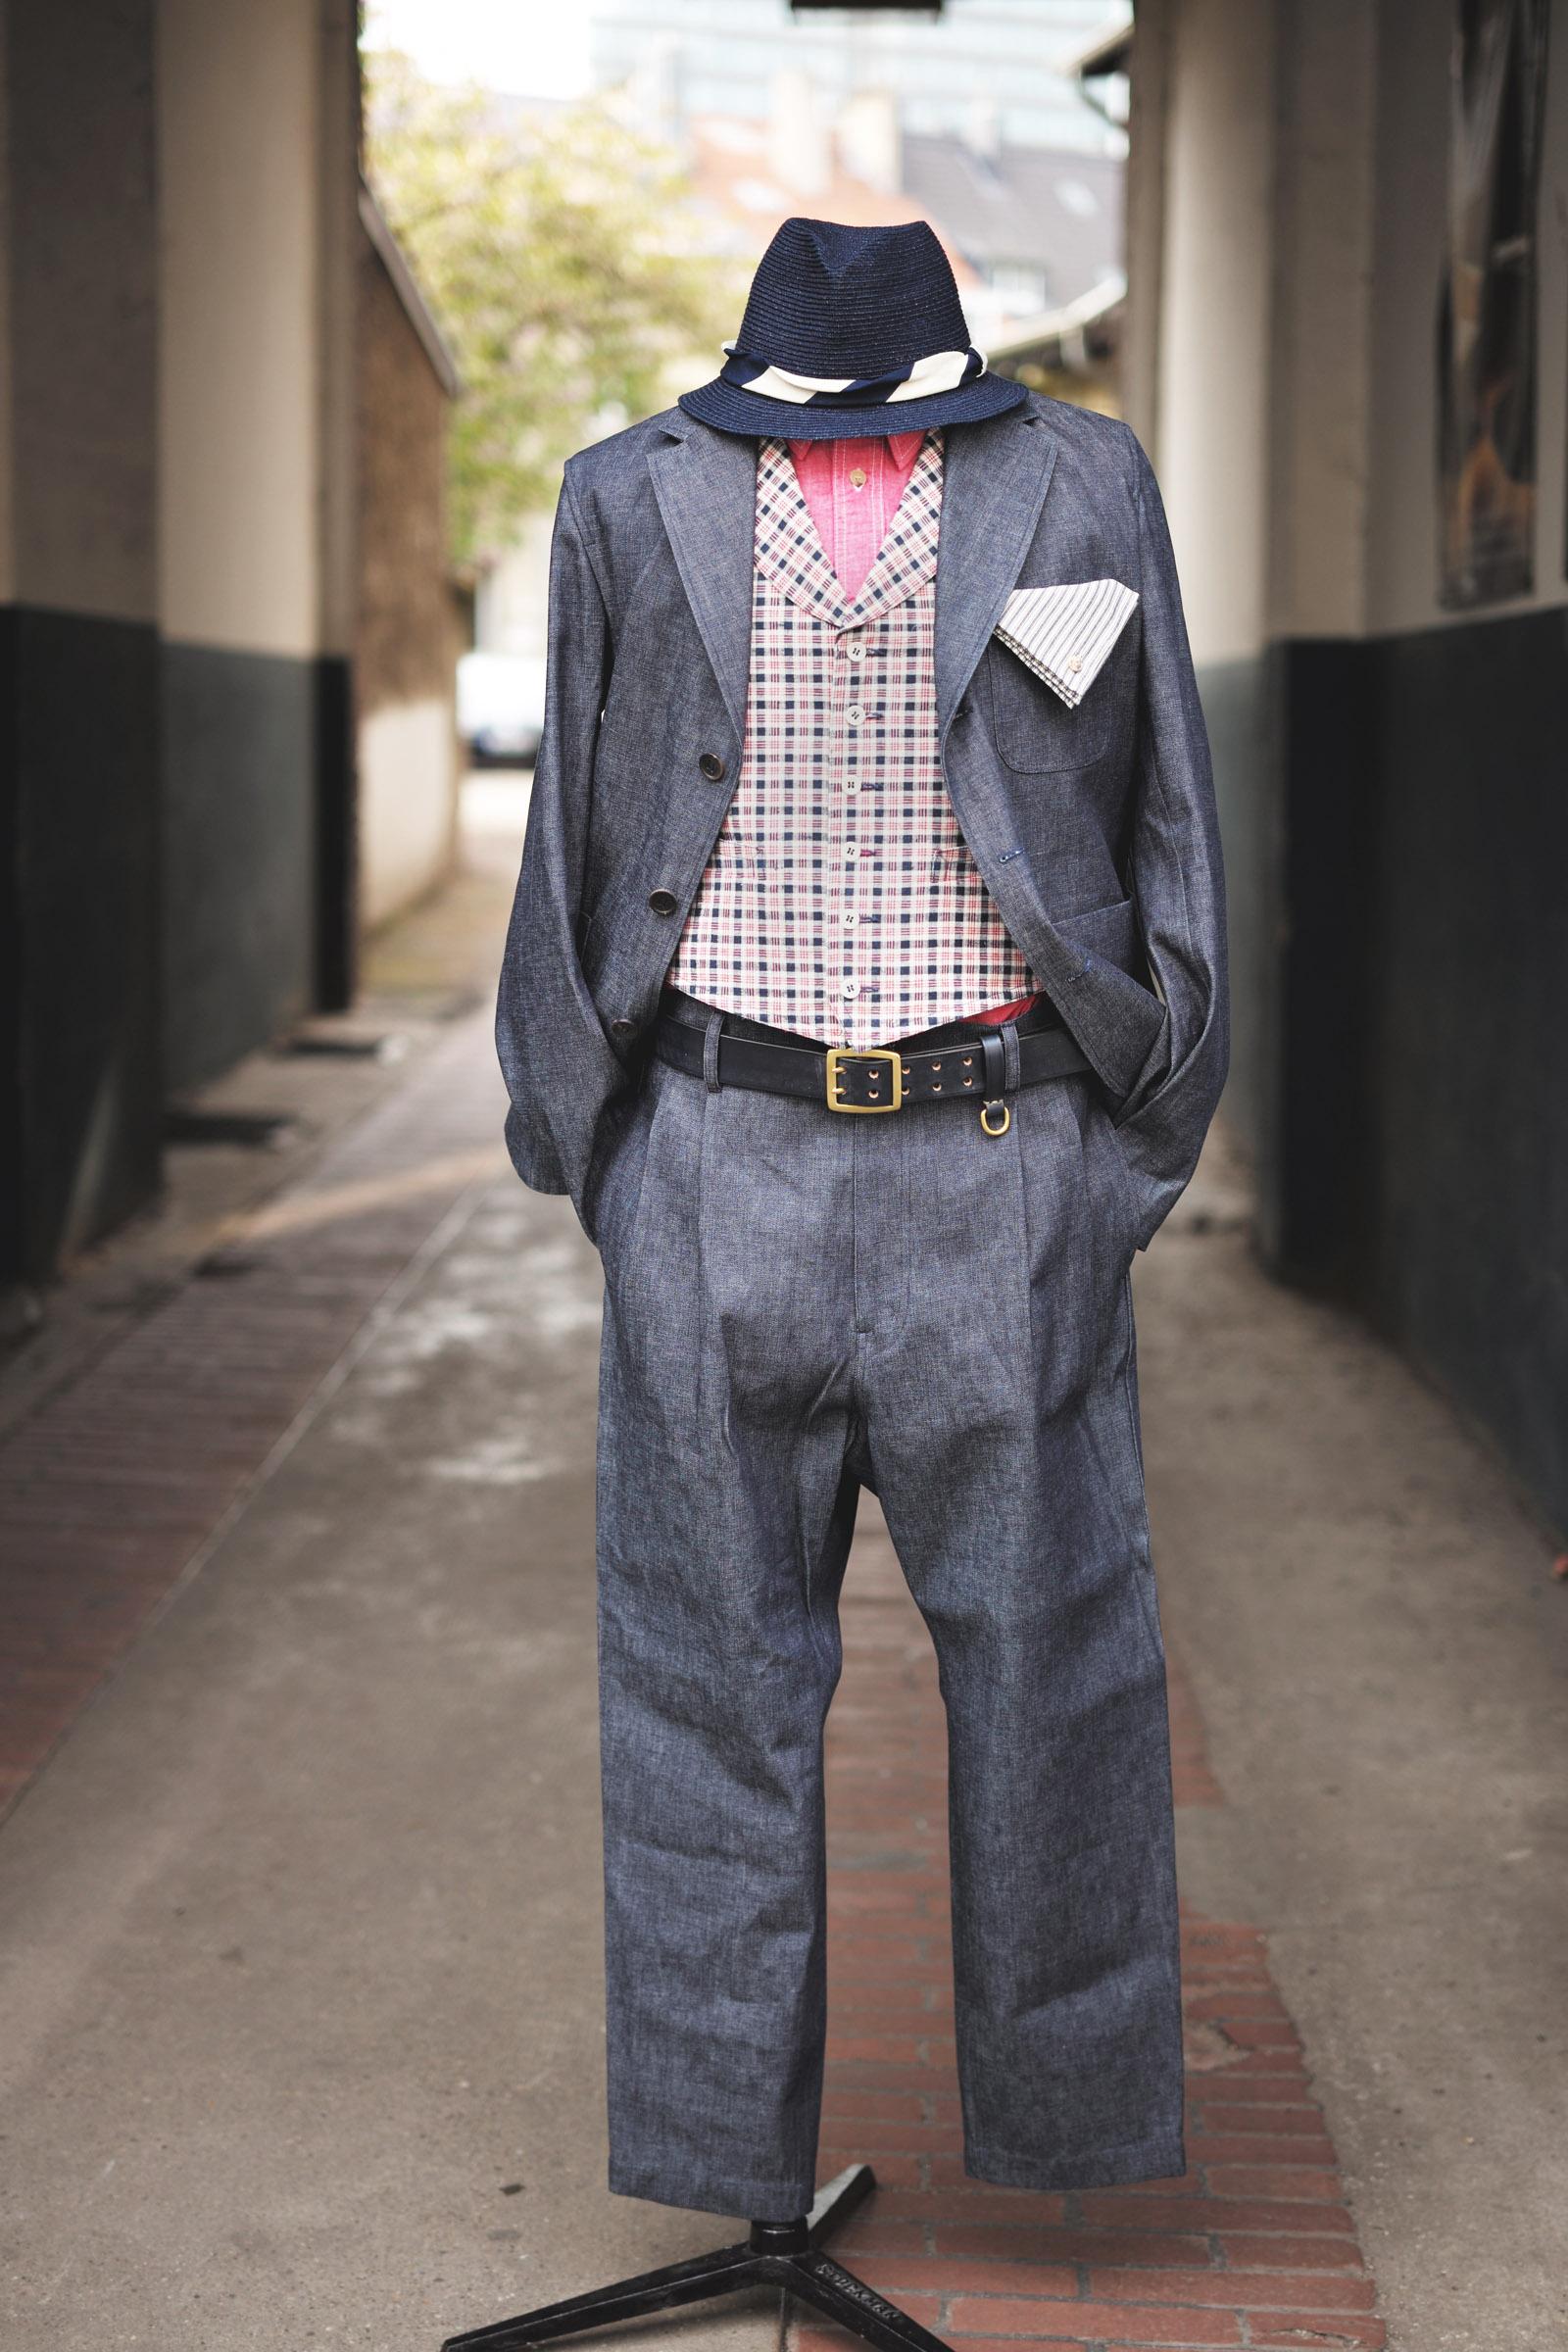 outfit-sofiedhoore-denimsuit-anzug-jeans-interbrigade-weste-kariert-timeless-gürtel-japanblue-hut-01